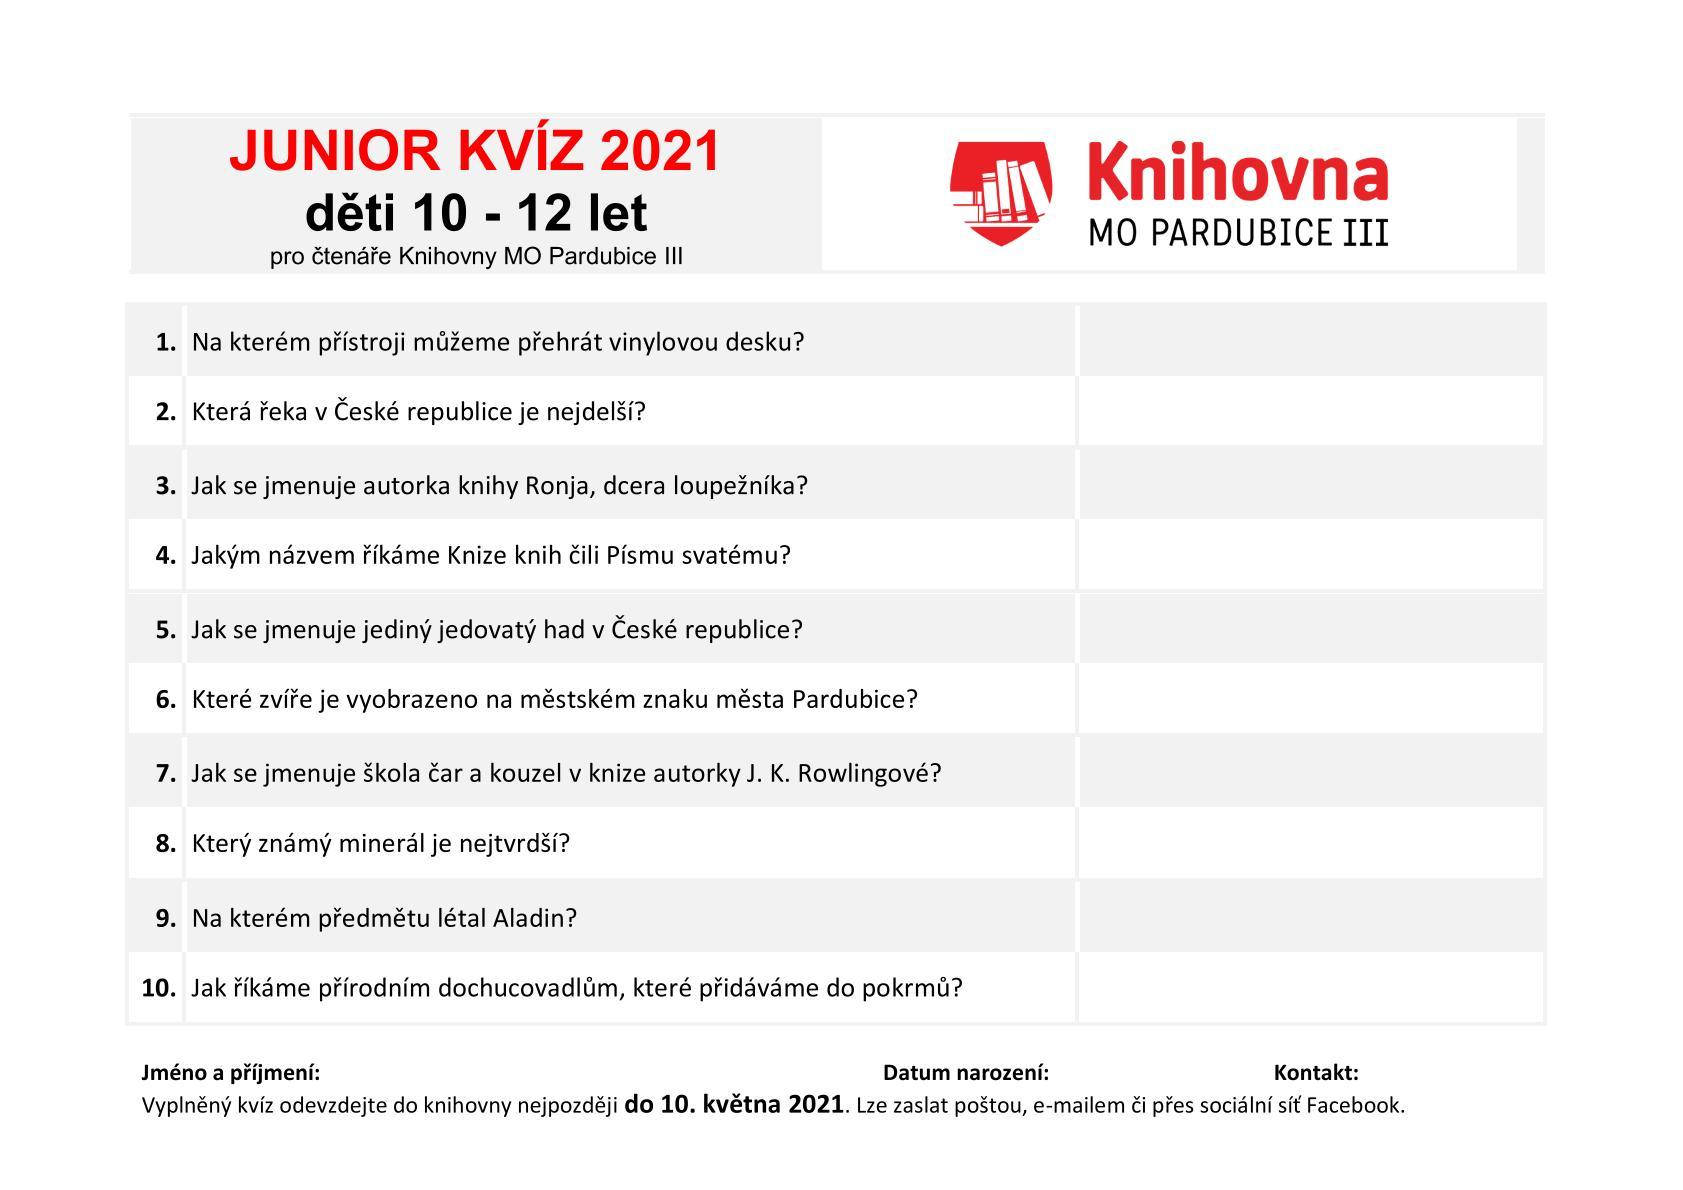 JUNIOR-KVIZ-10_12-let-2021